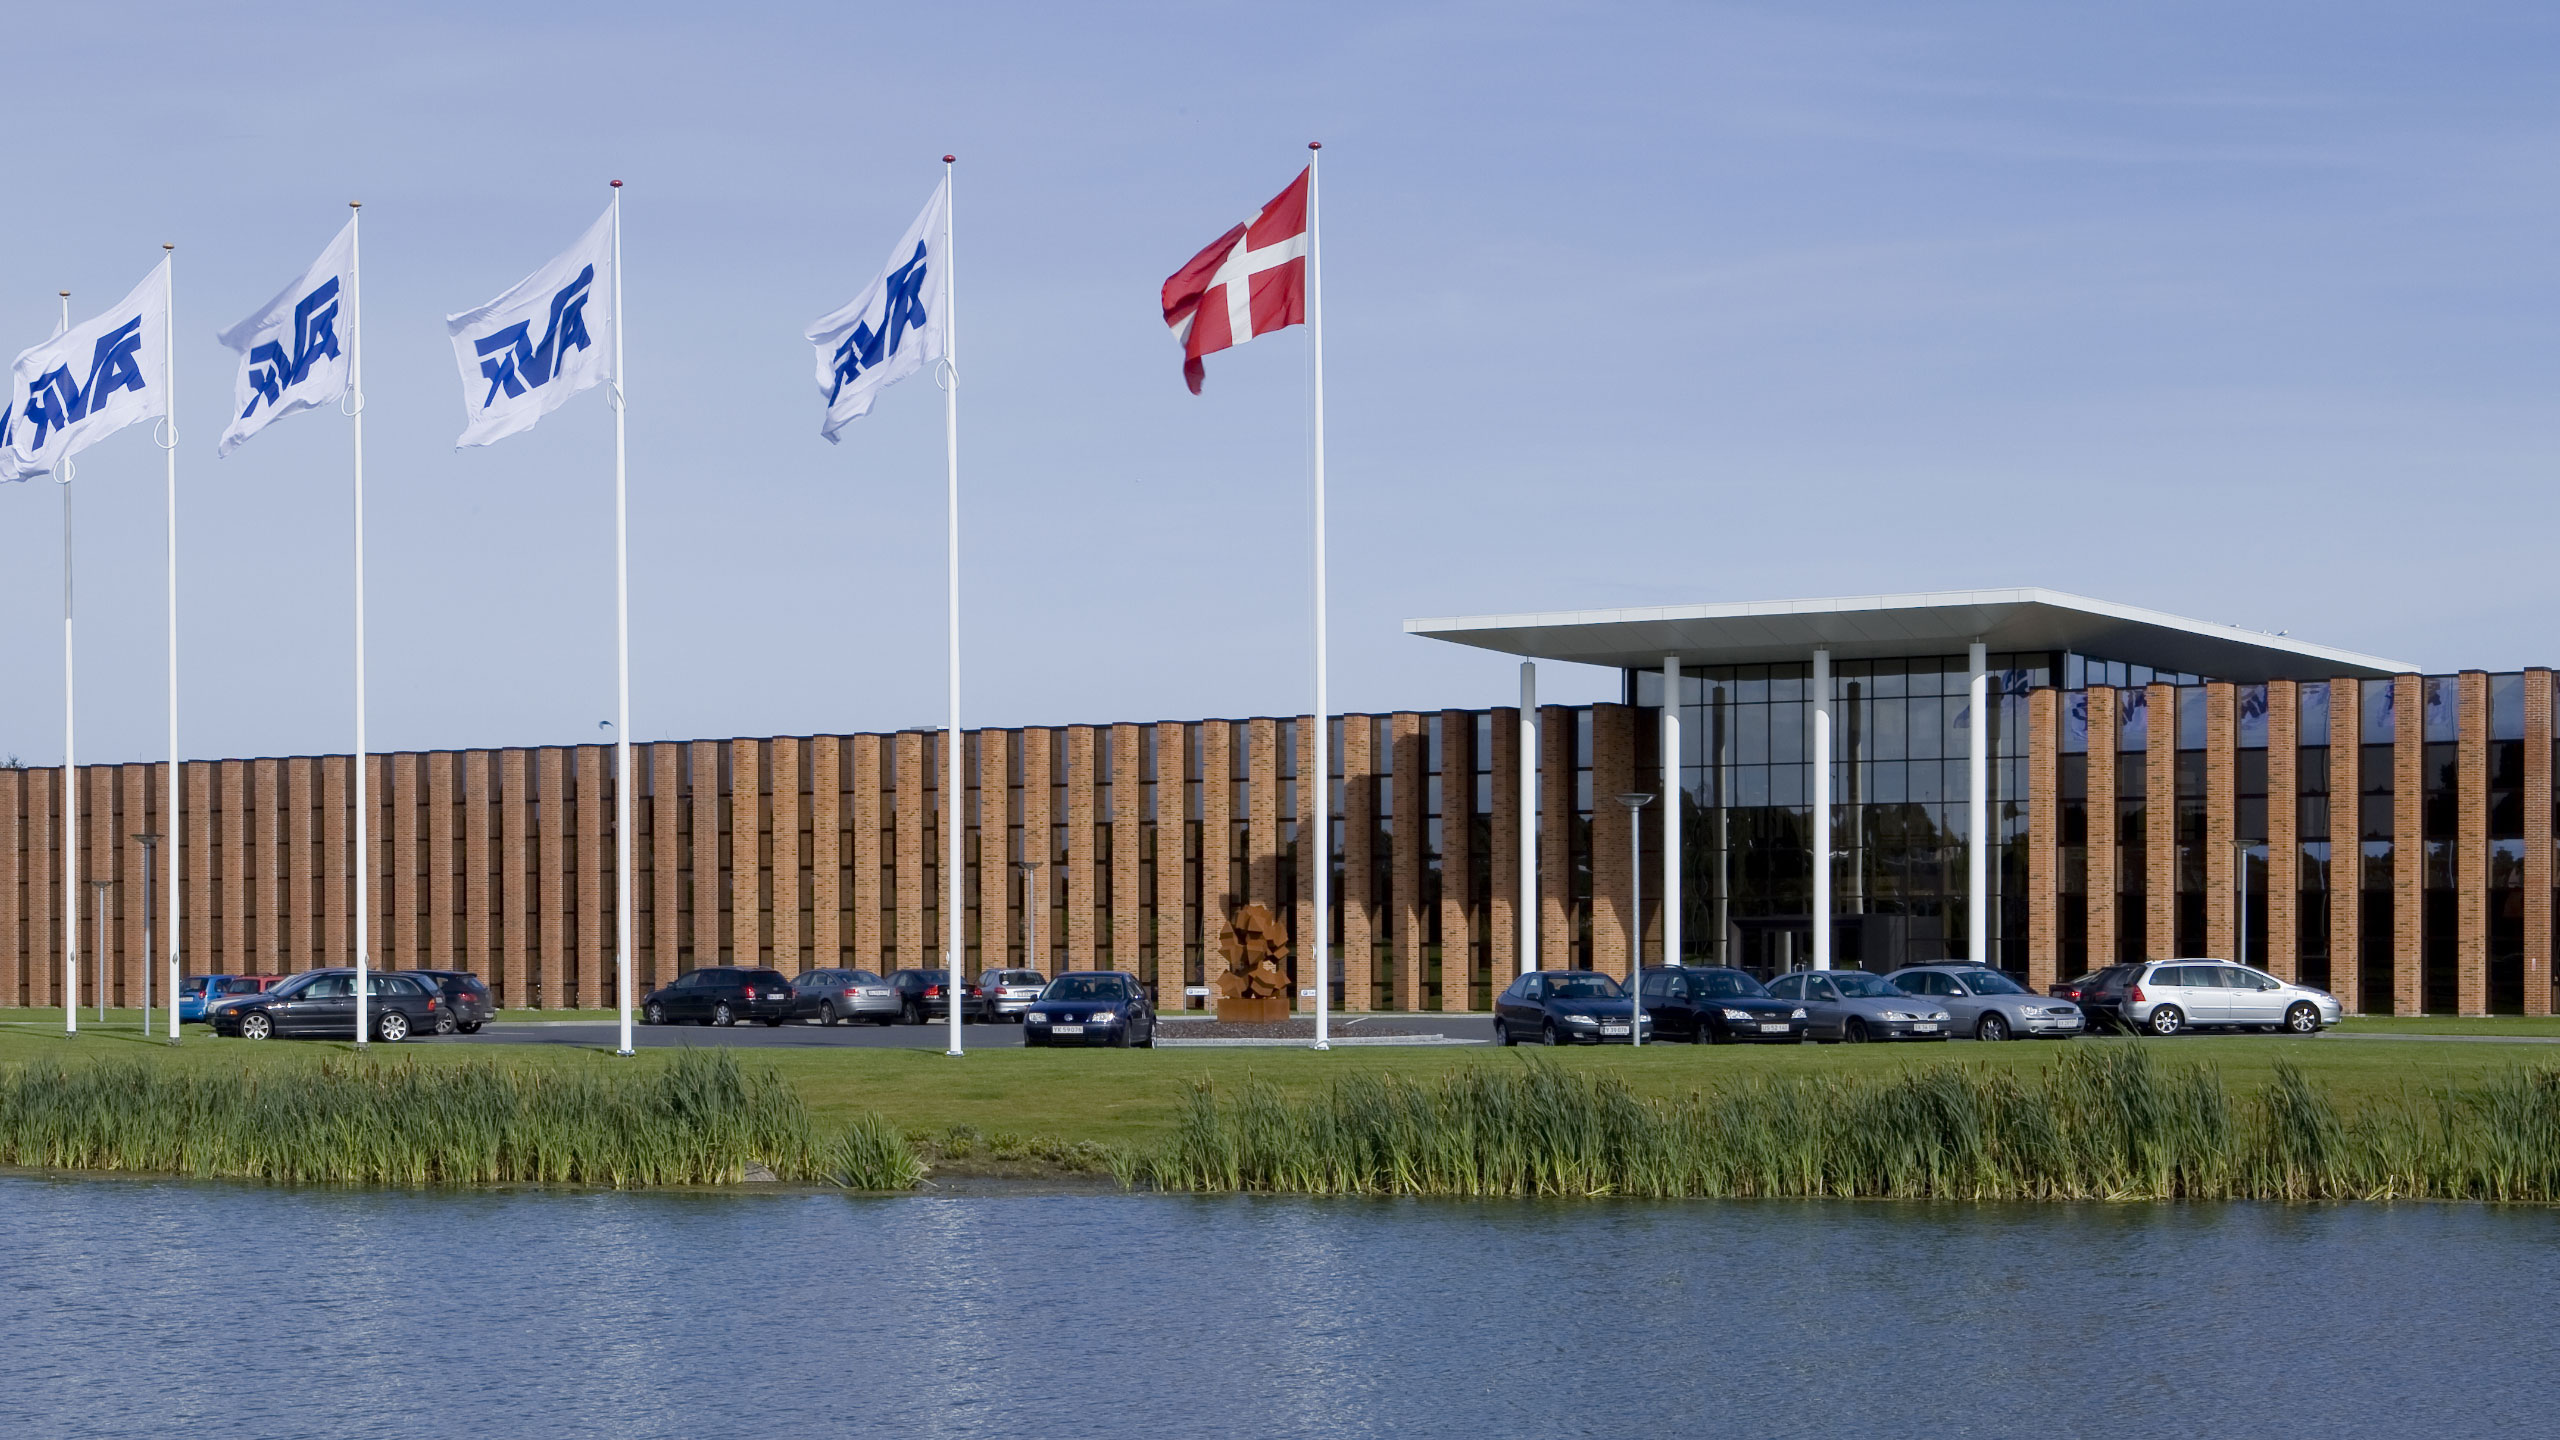 AVK International Skovby